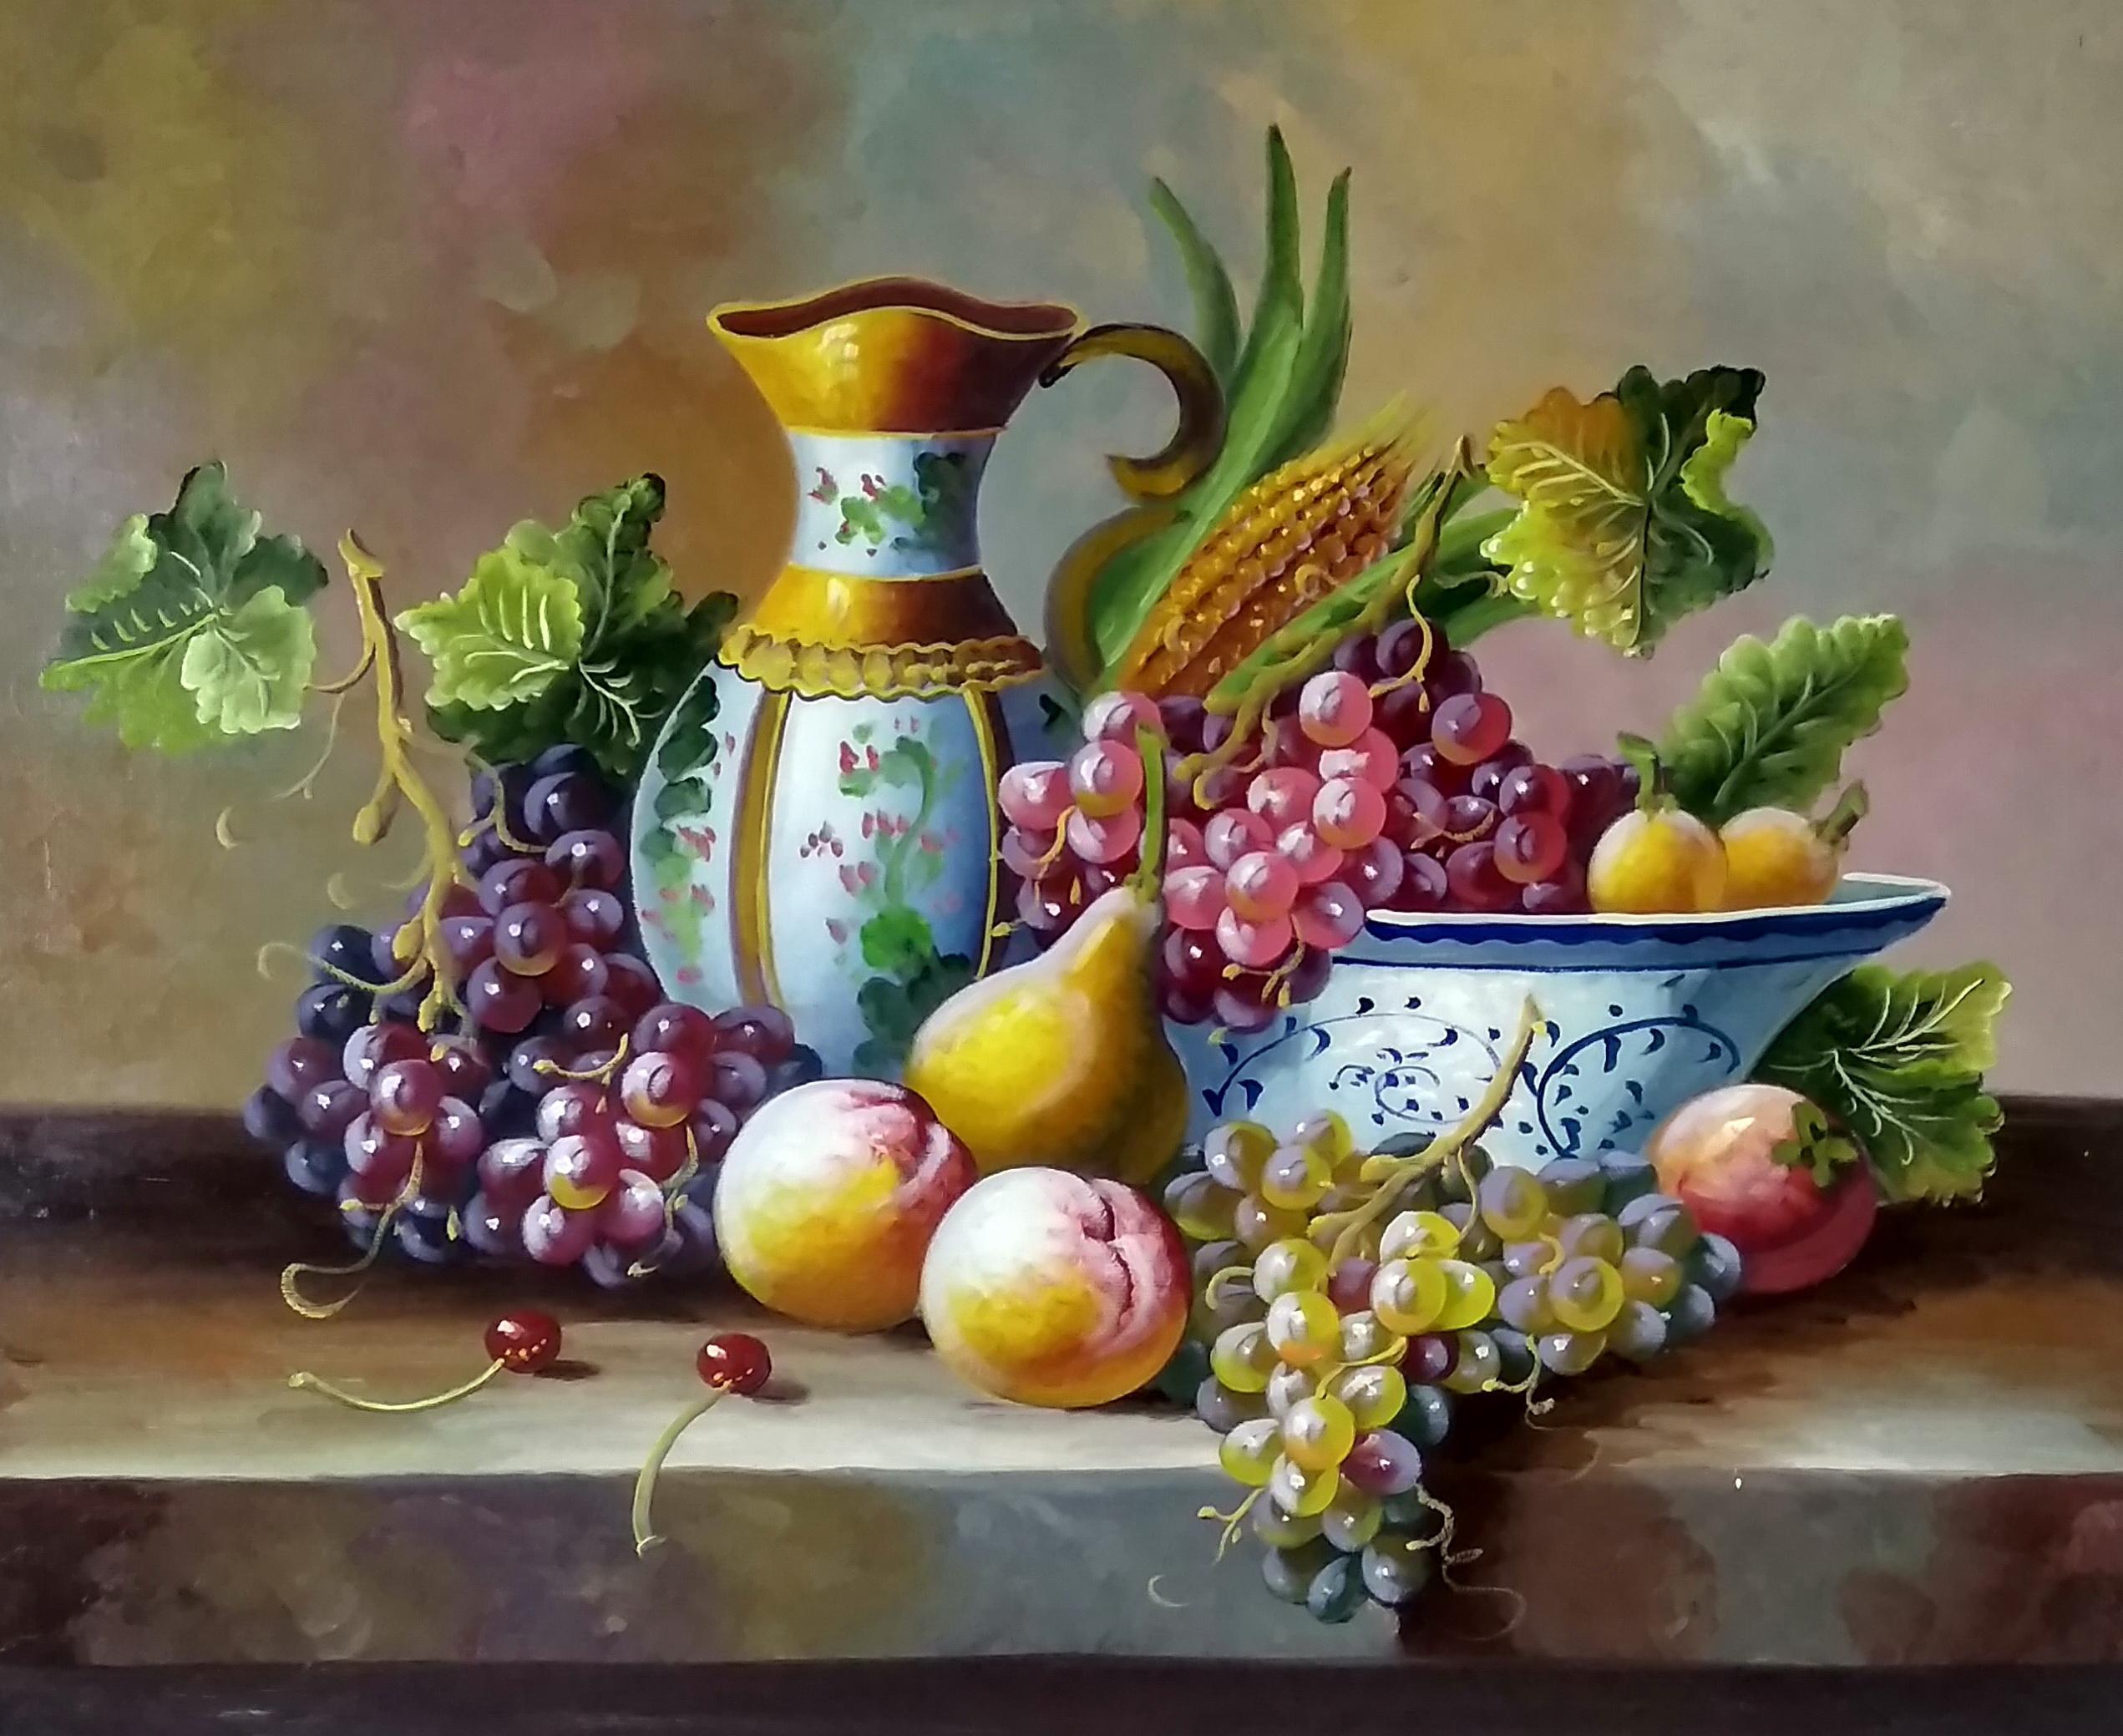 «Натюрморт с кувшином» картина 50х60 арт.5ц294